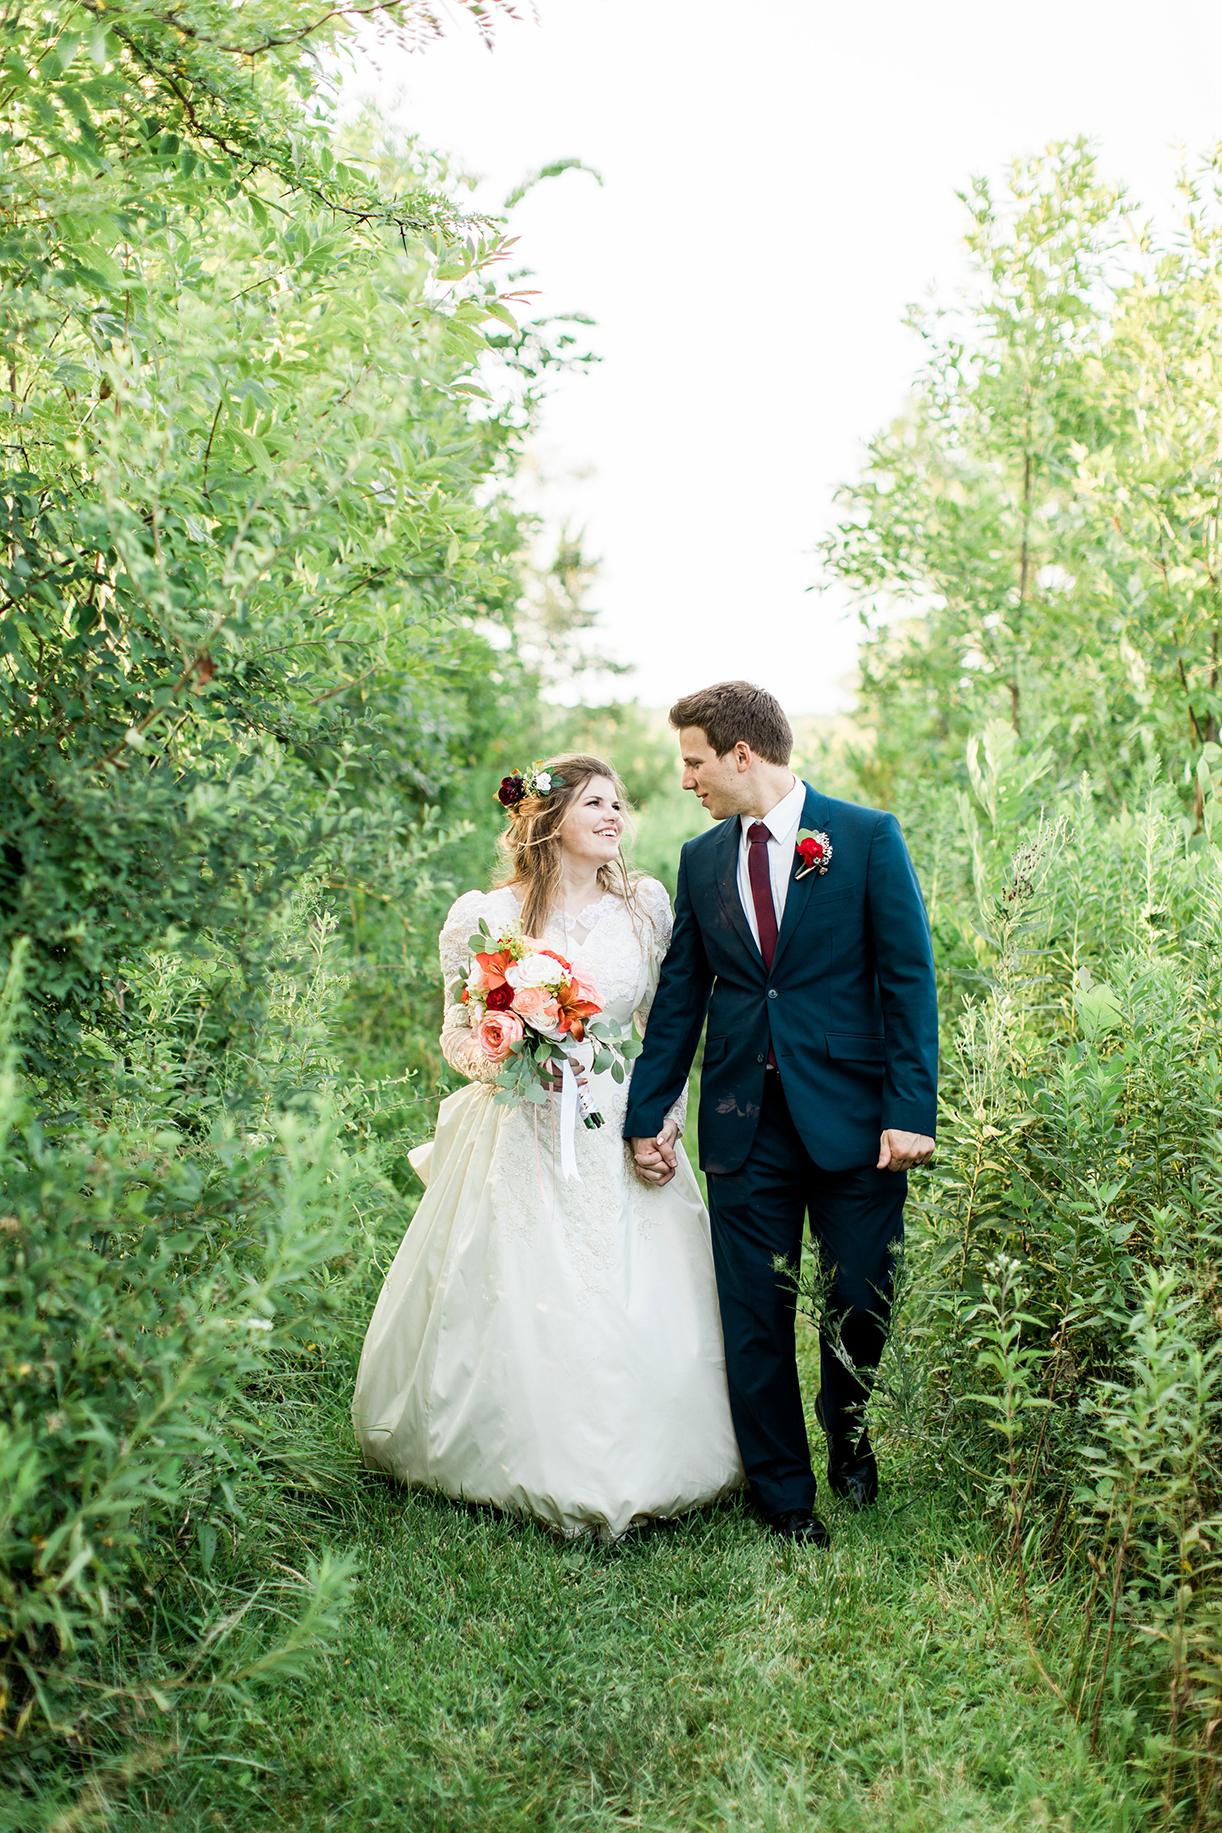 Jared Gabby Wedding August 1 2018-print-0211.jpg